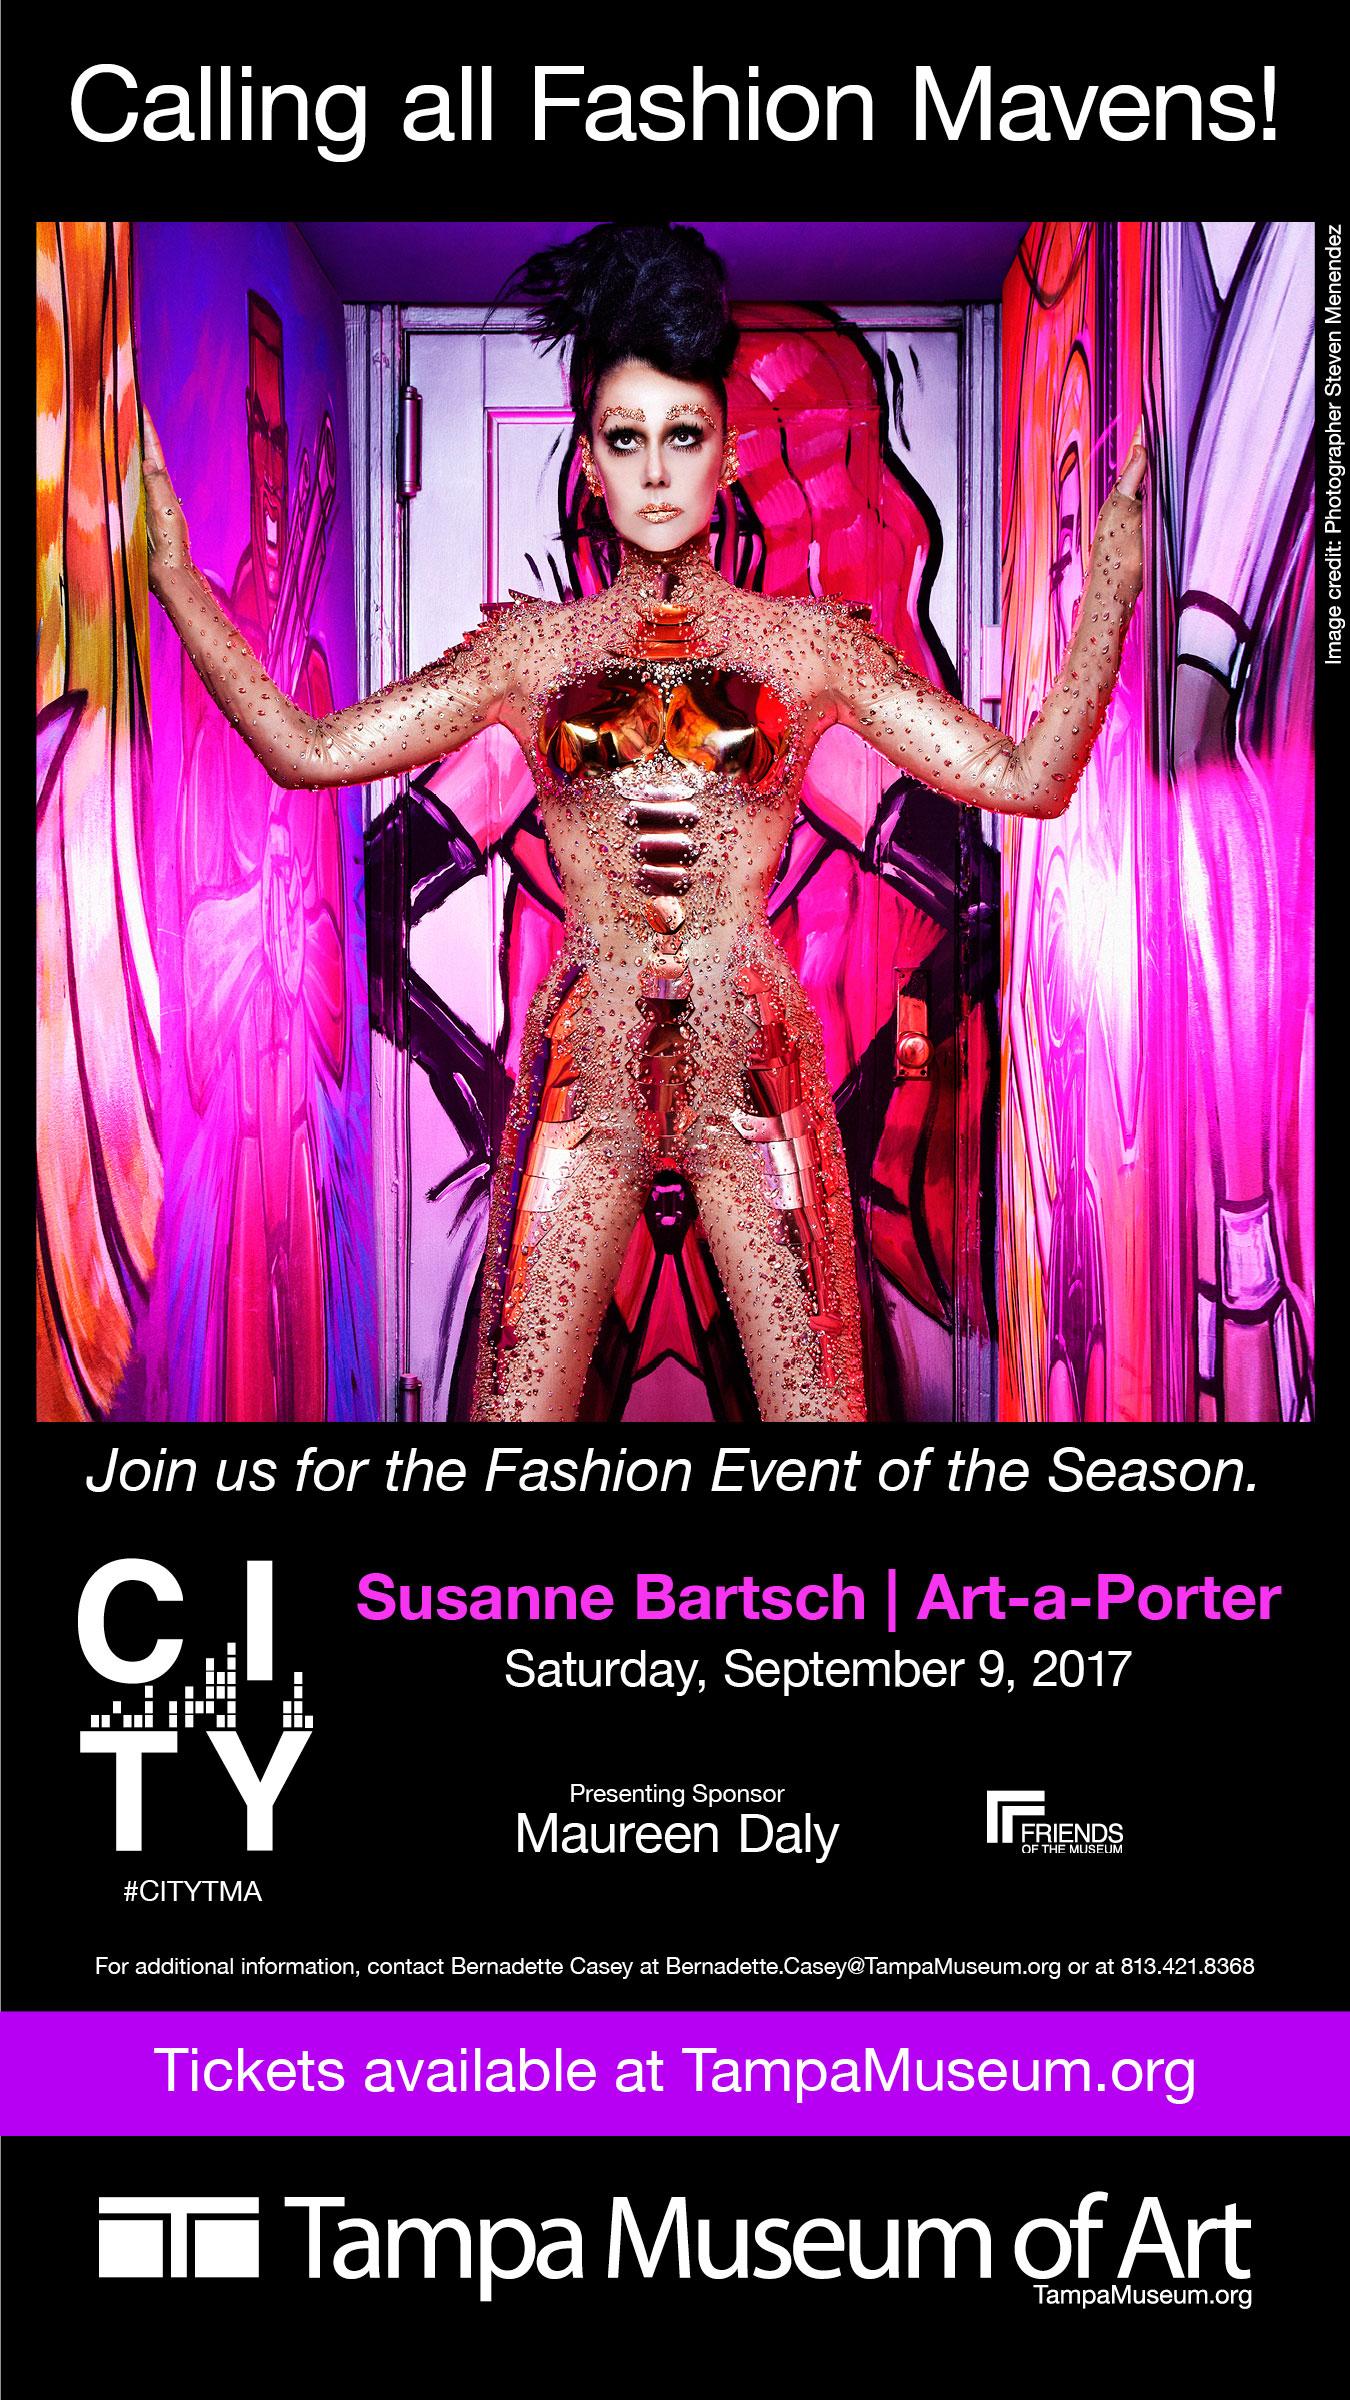 Calling all fashion mavenscity2017-lobbymonitor2 (2) 8.11.17.jpg